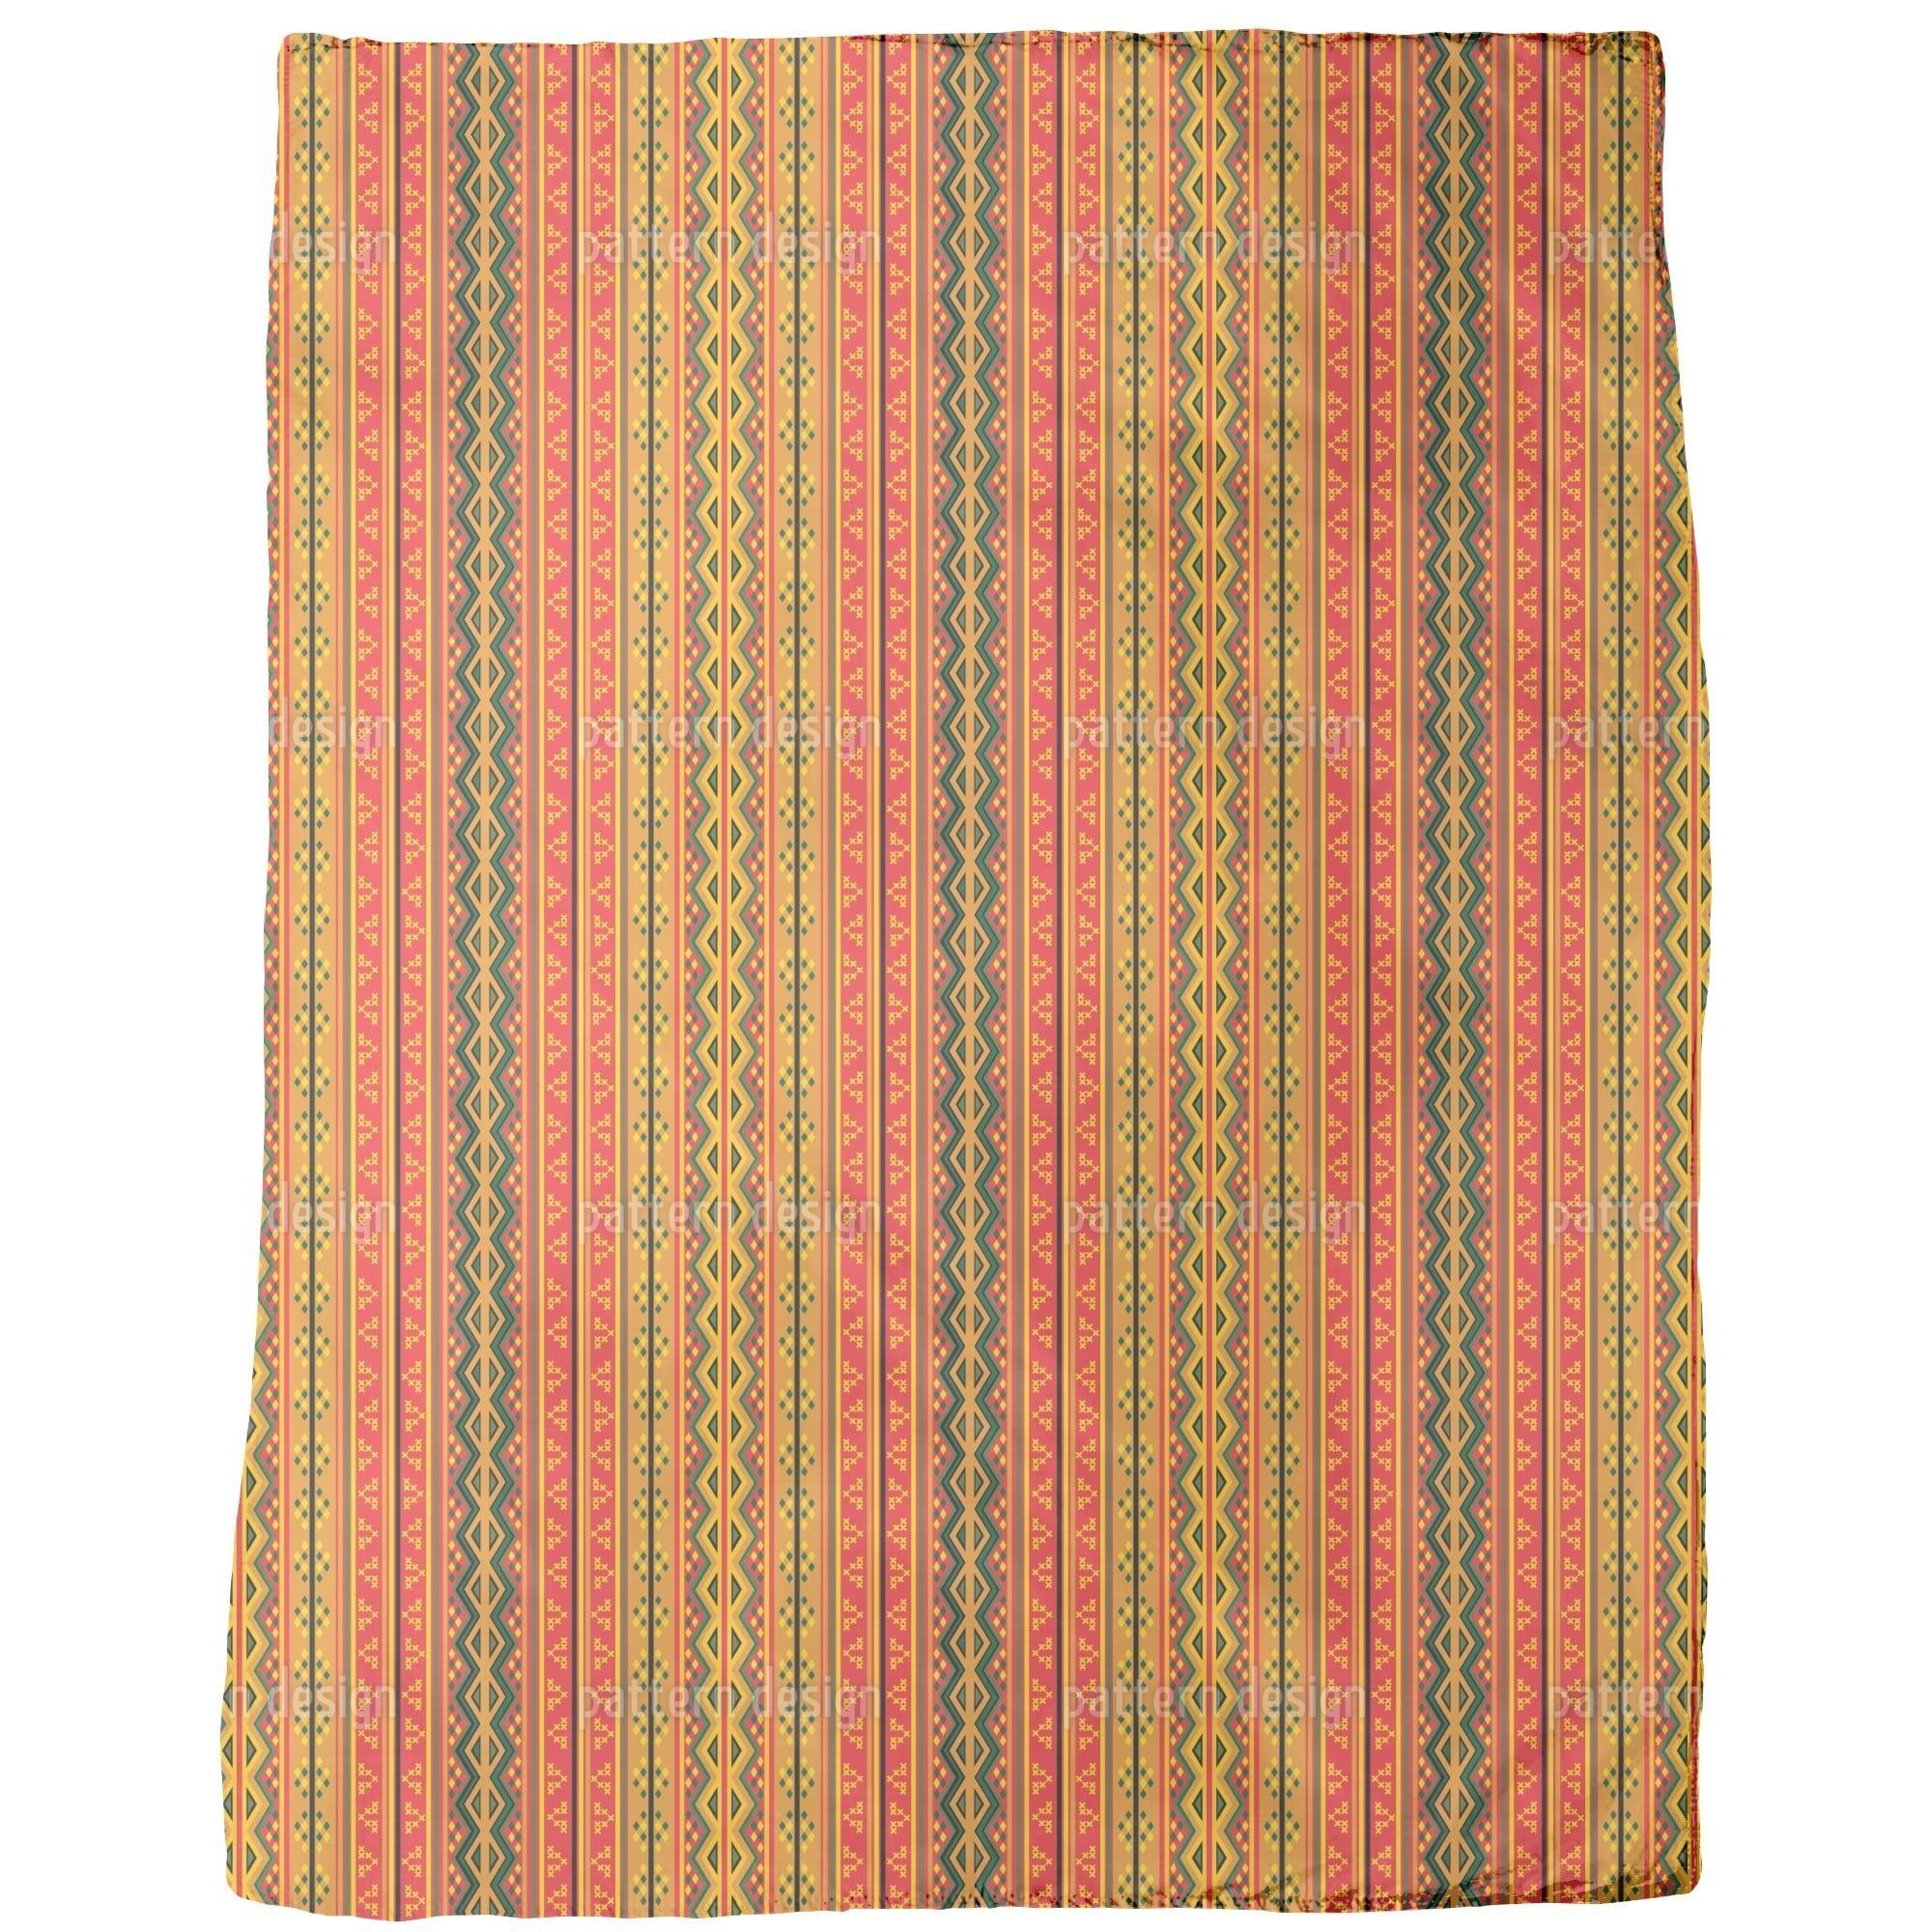 Uneekee Poncho is Wandering on Stripes Fleece Blanket (Me...